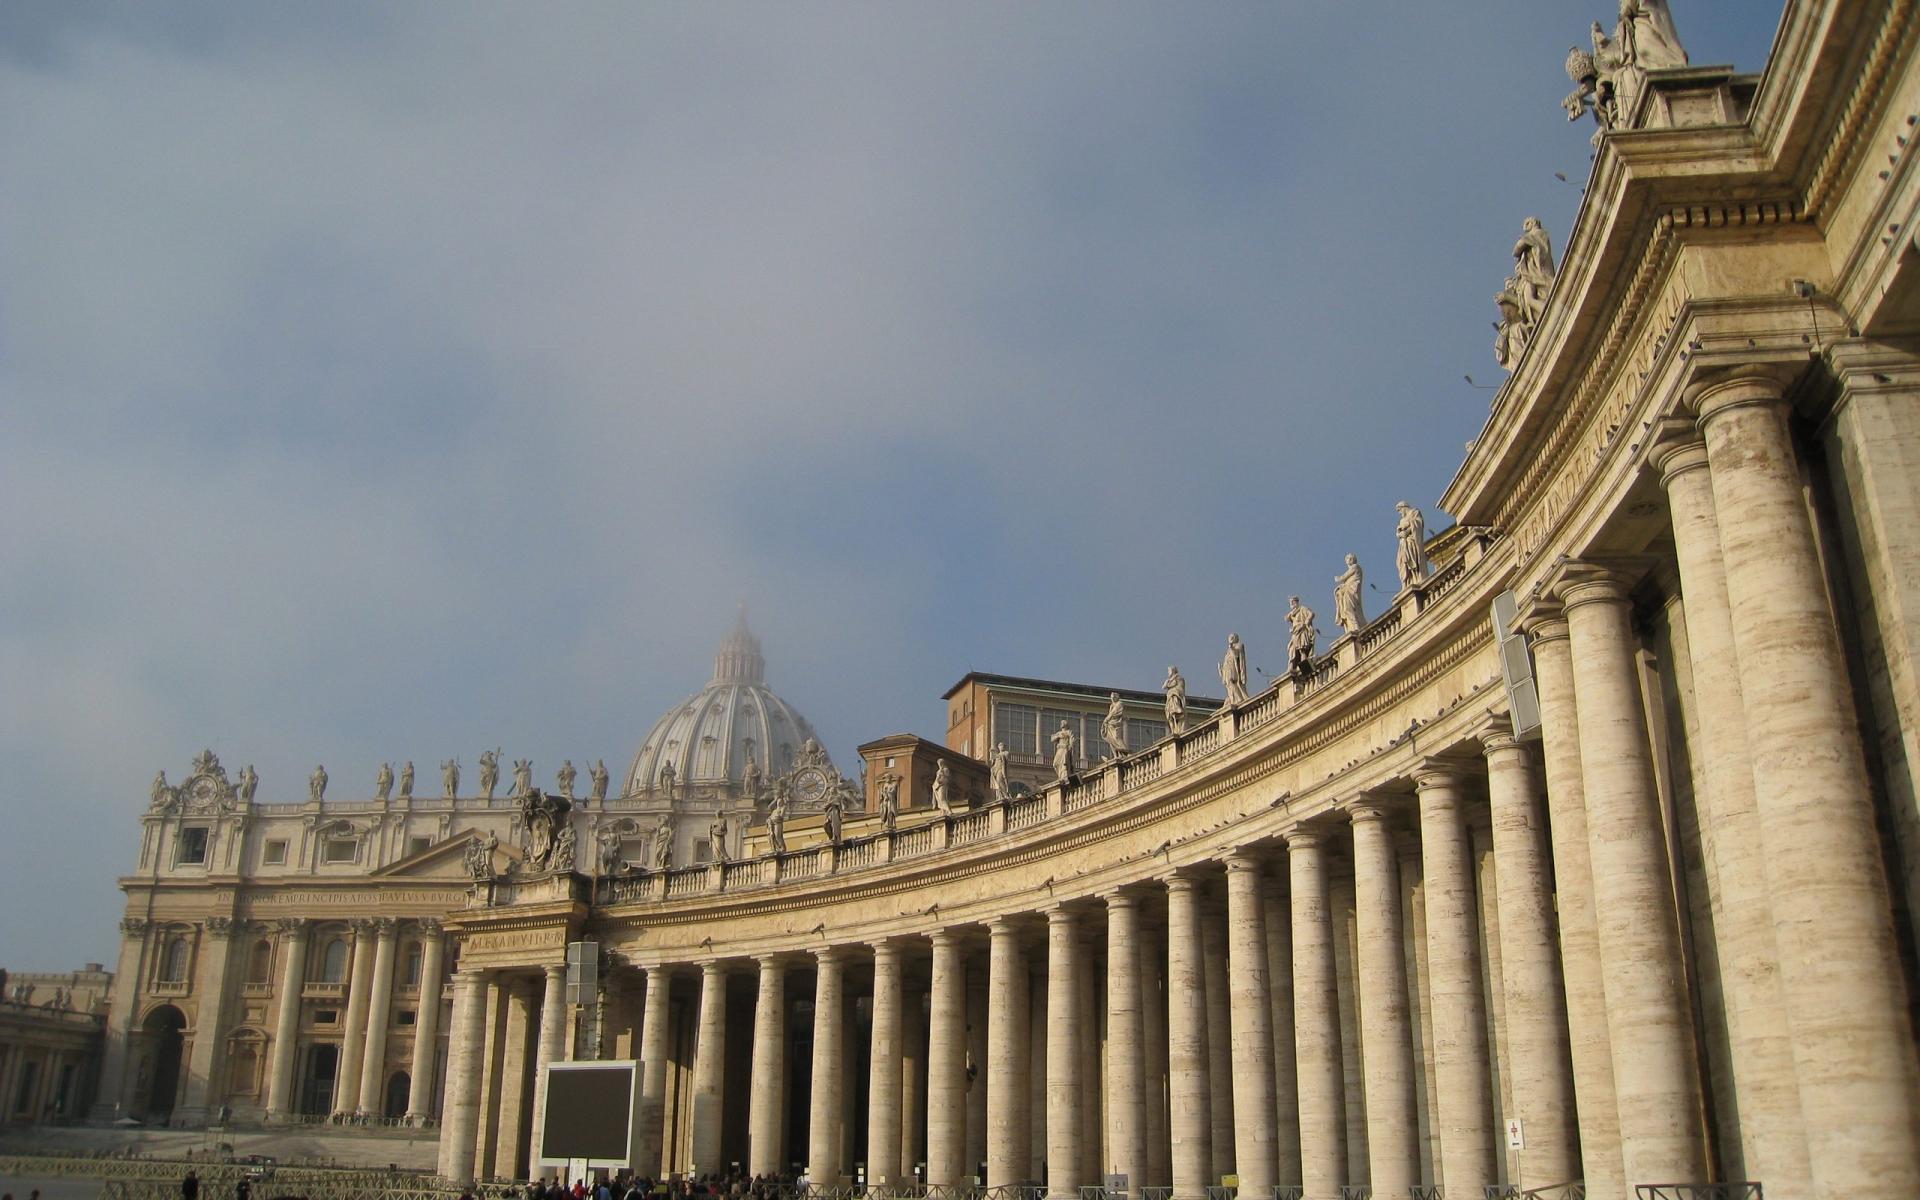 vatican wallpapers travel world - photo #7